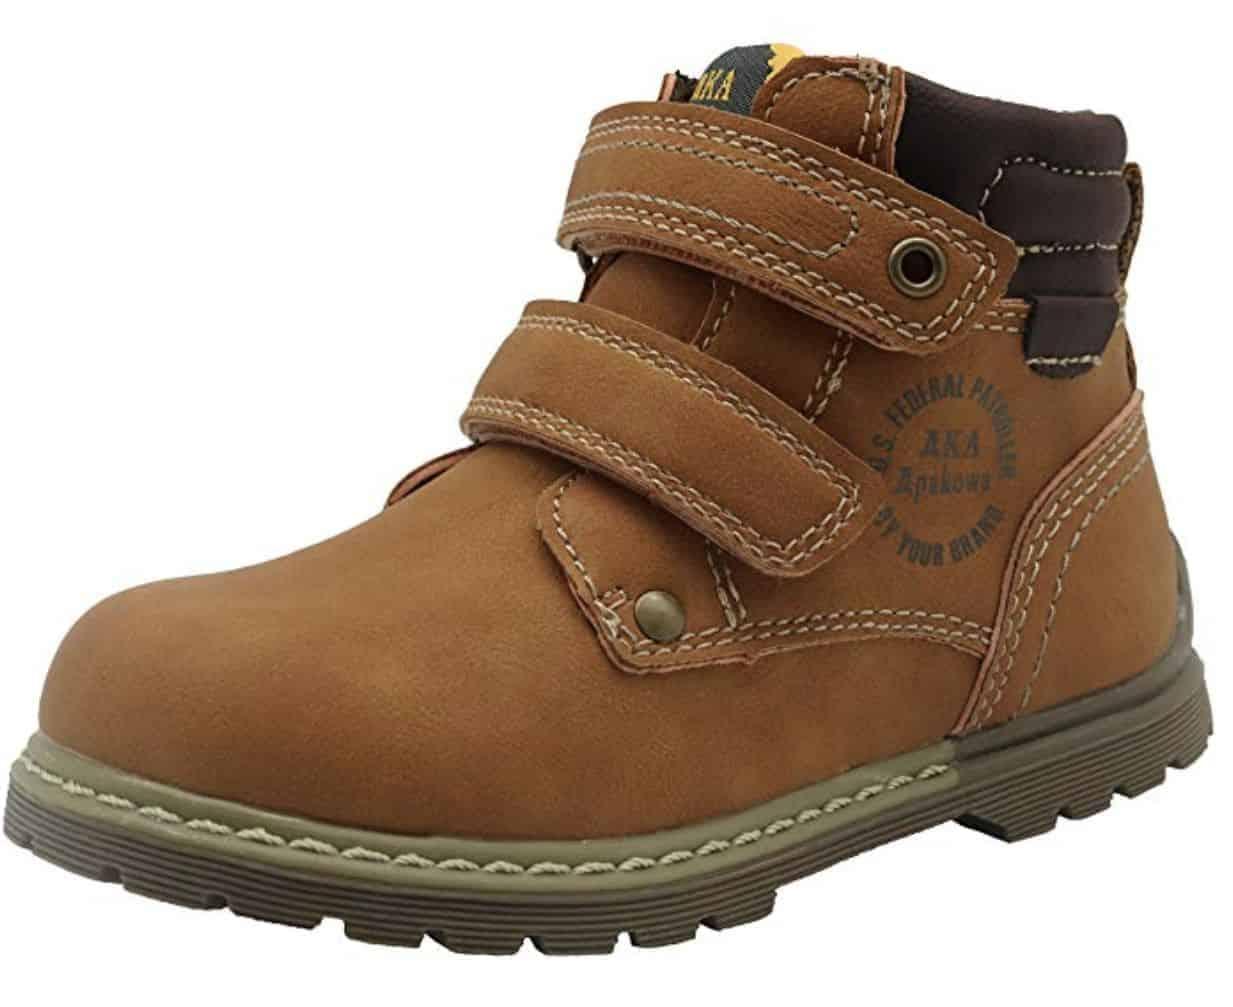 Toddler Boy Cowboy Martin Boots